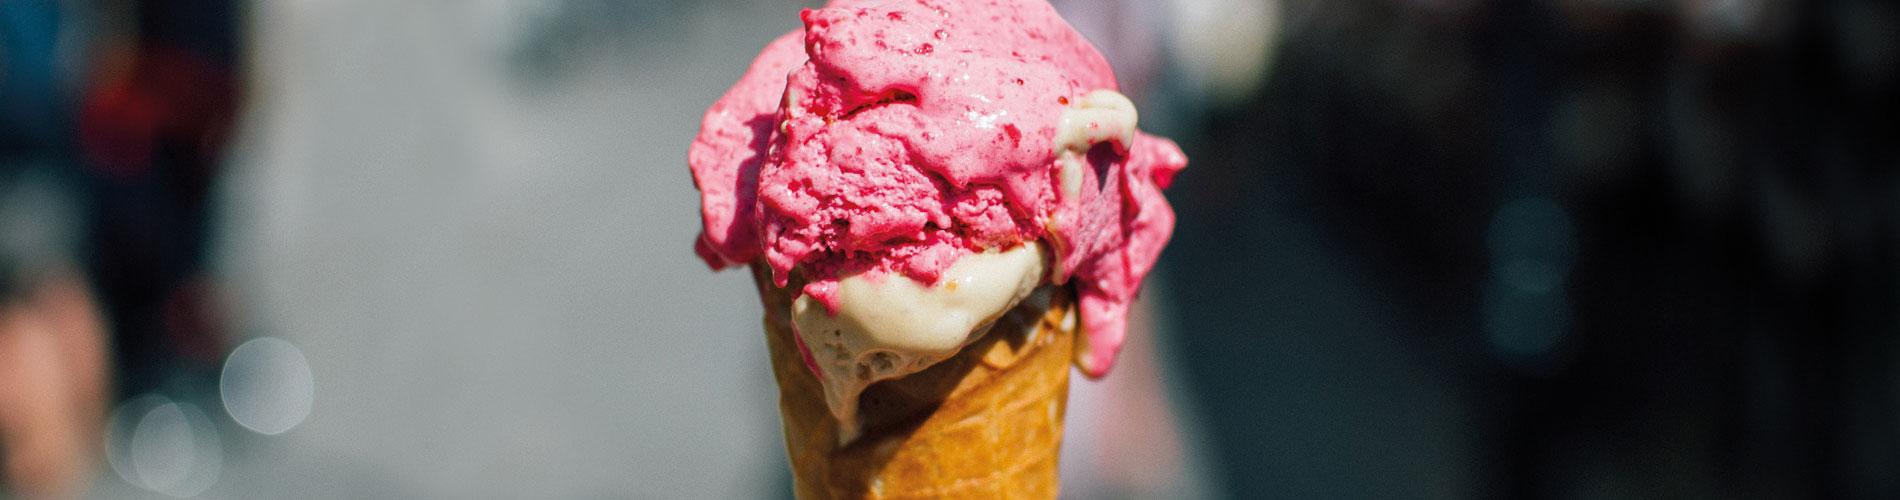 Blog_Veganuary_Van-Leeuwen-Ice-Cream_1900x500_Q120